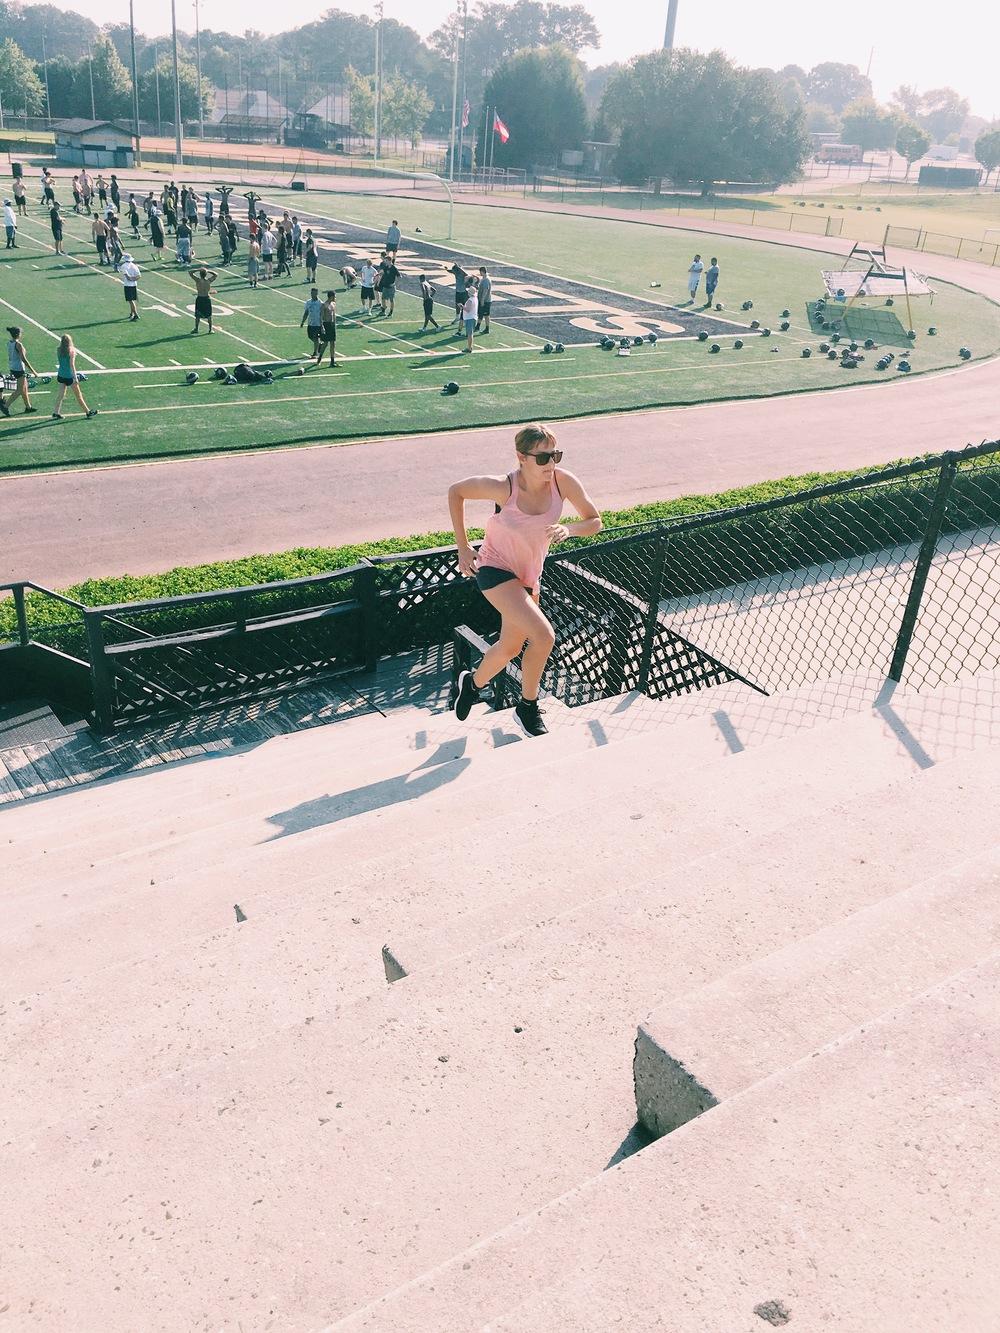 BBG HIIT workout